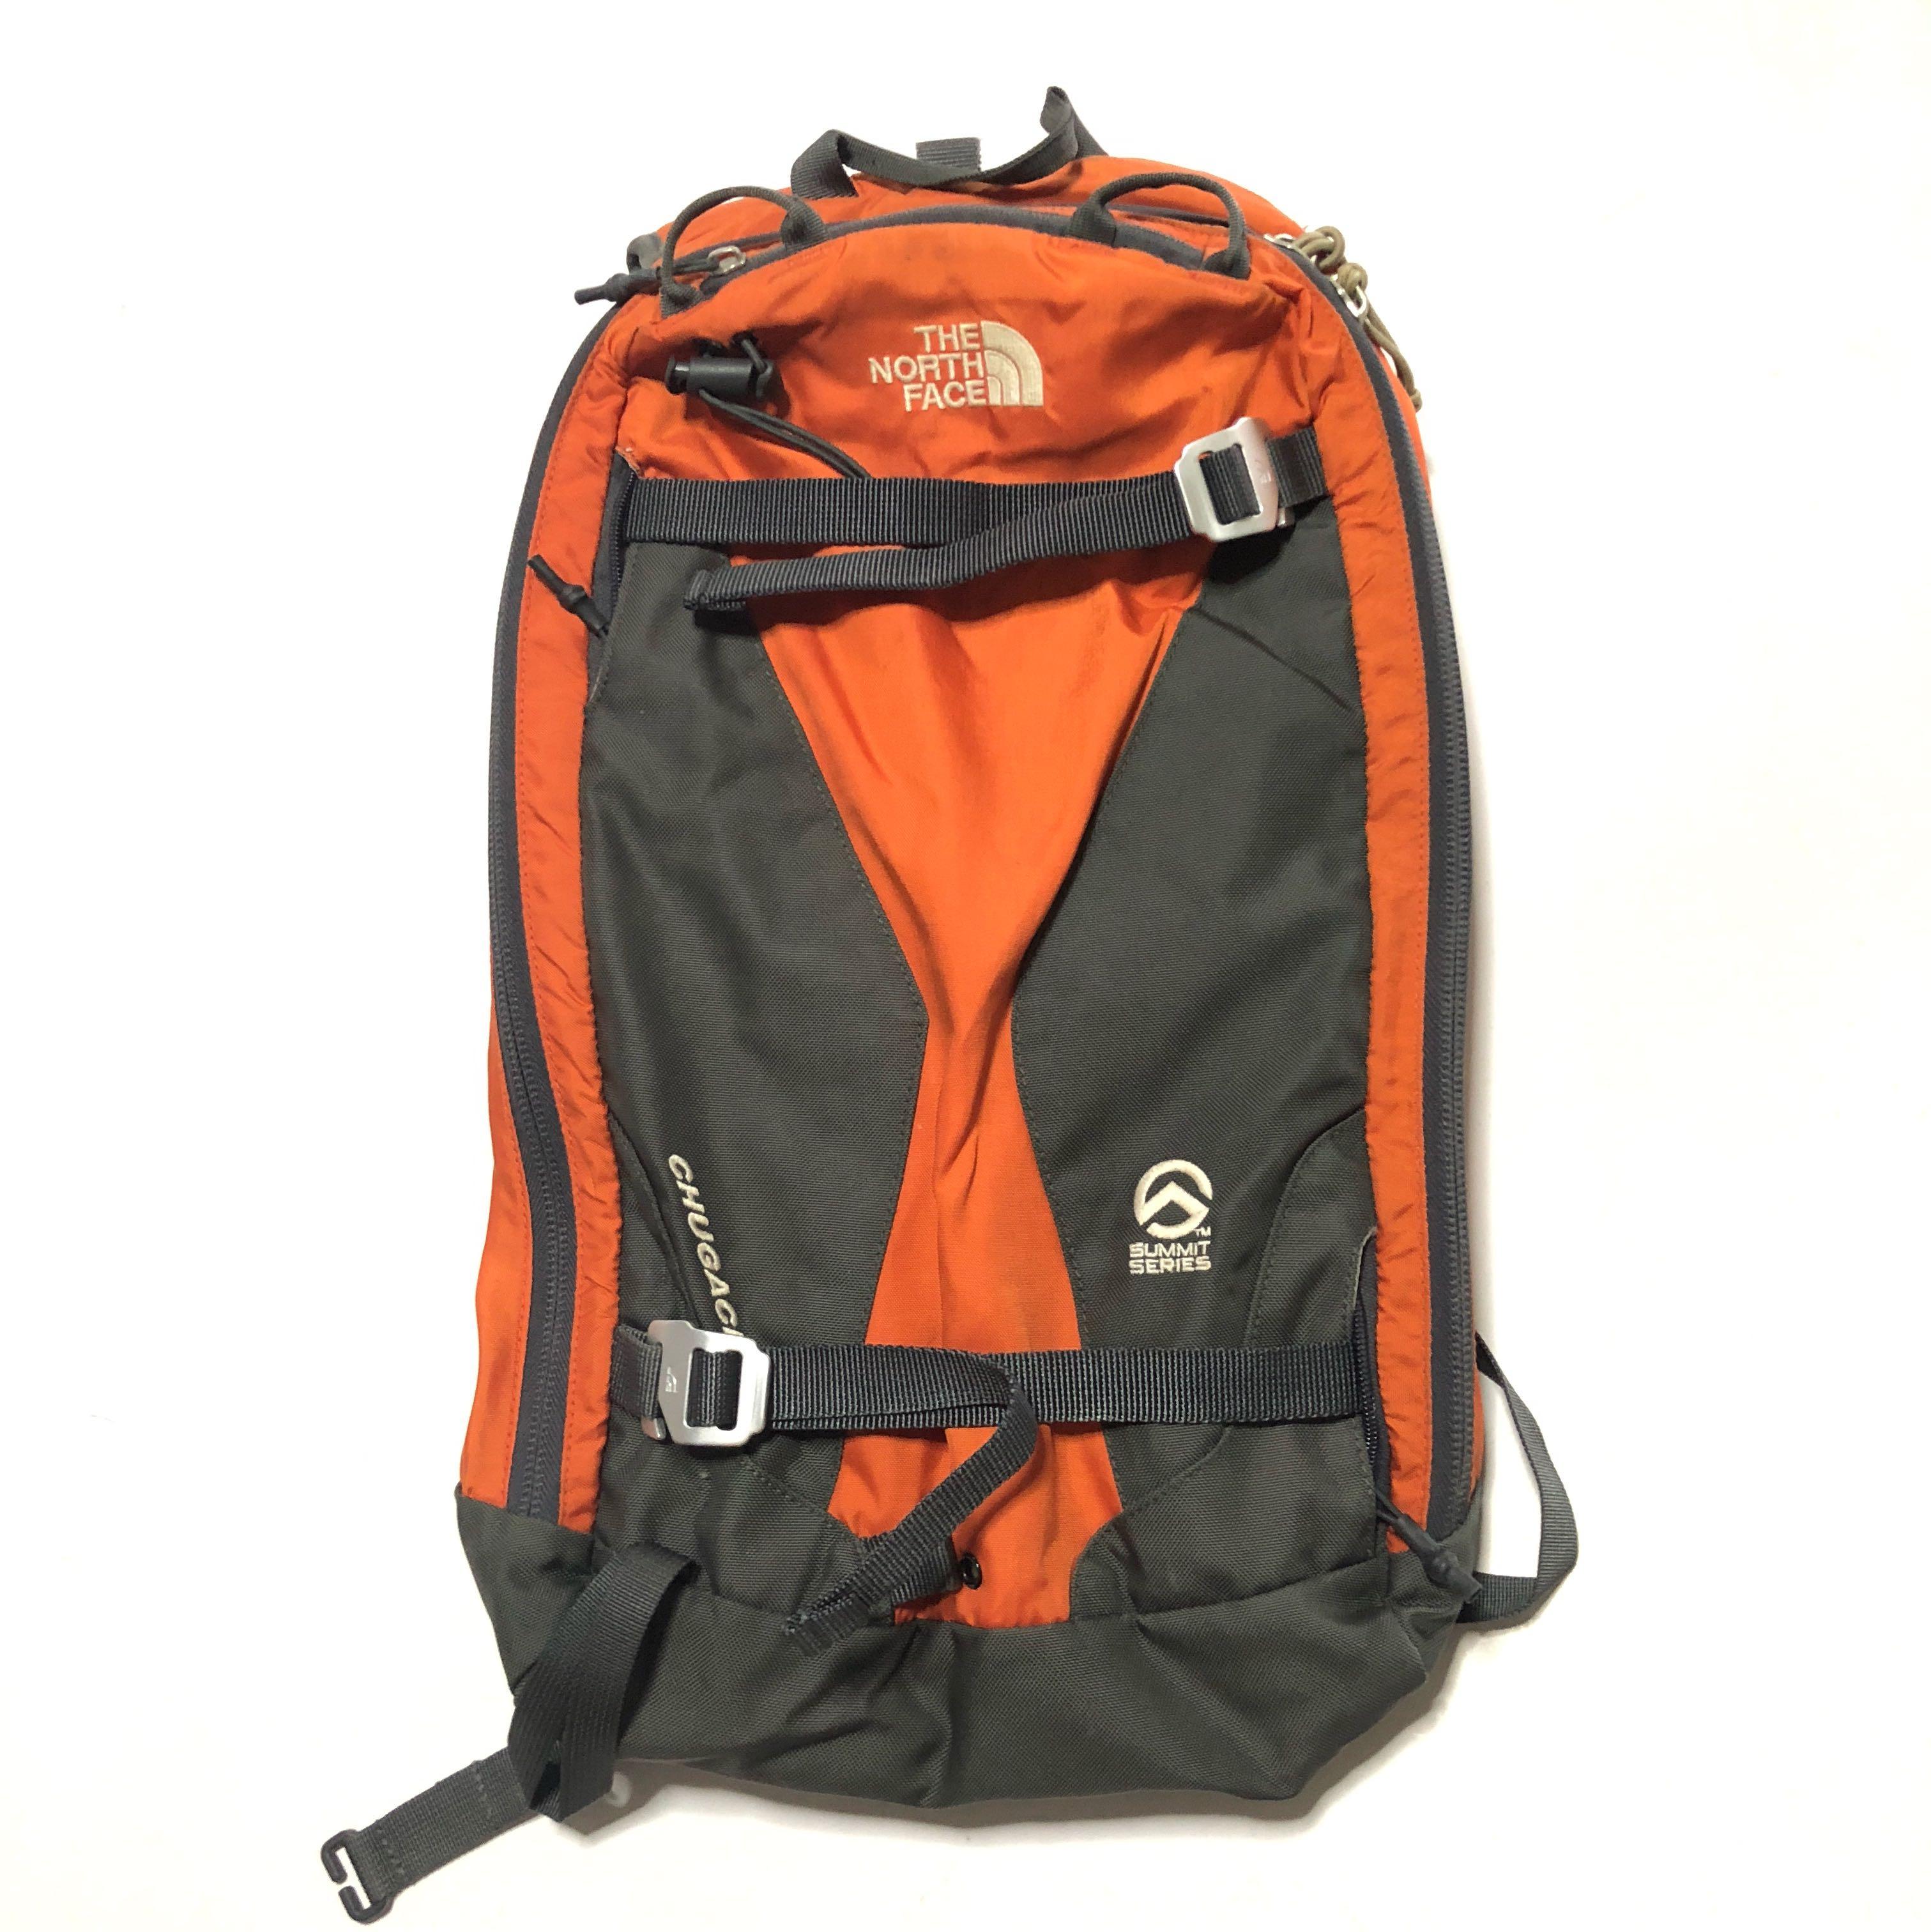 9cbbd90959 The North Face Chugach 12 liter Ski pack, Sports, Sports & Games ...